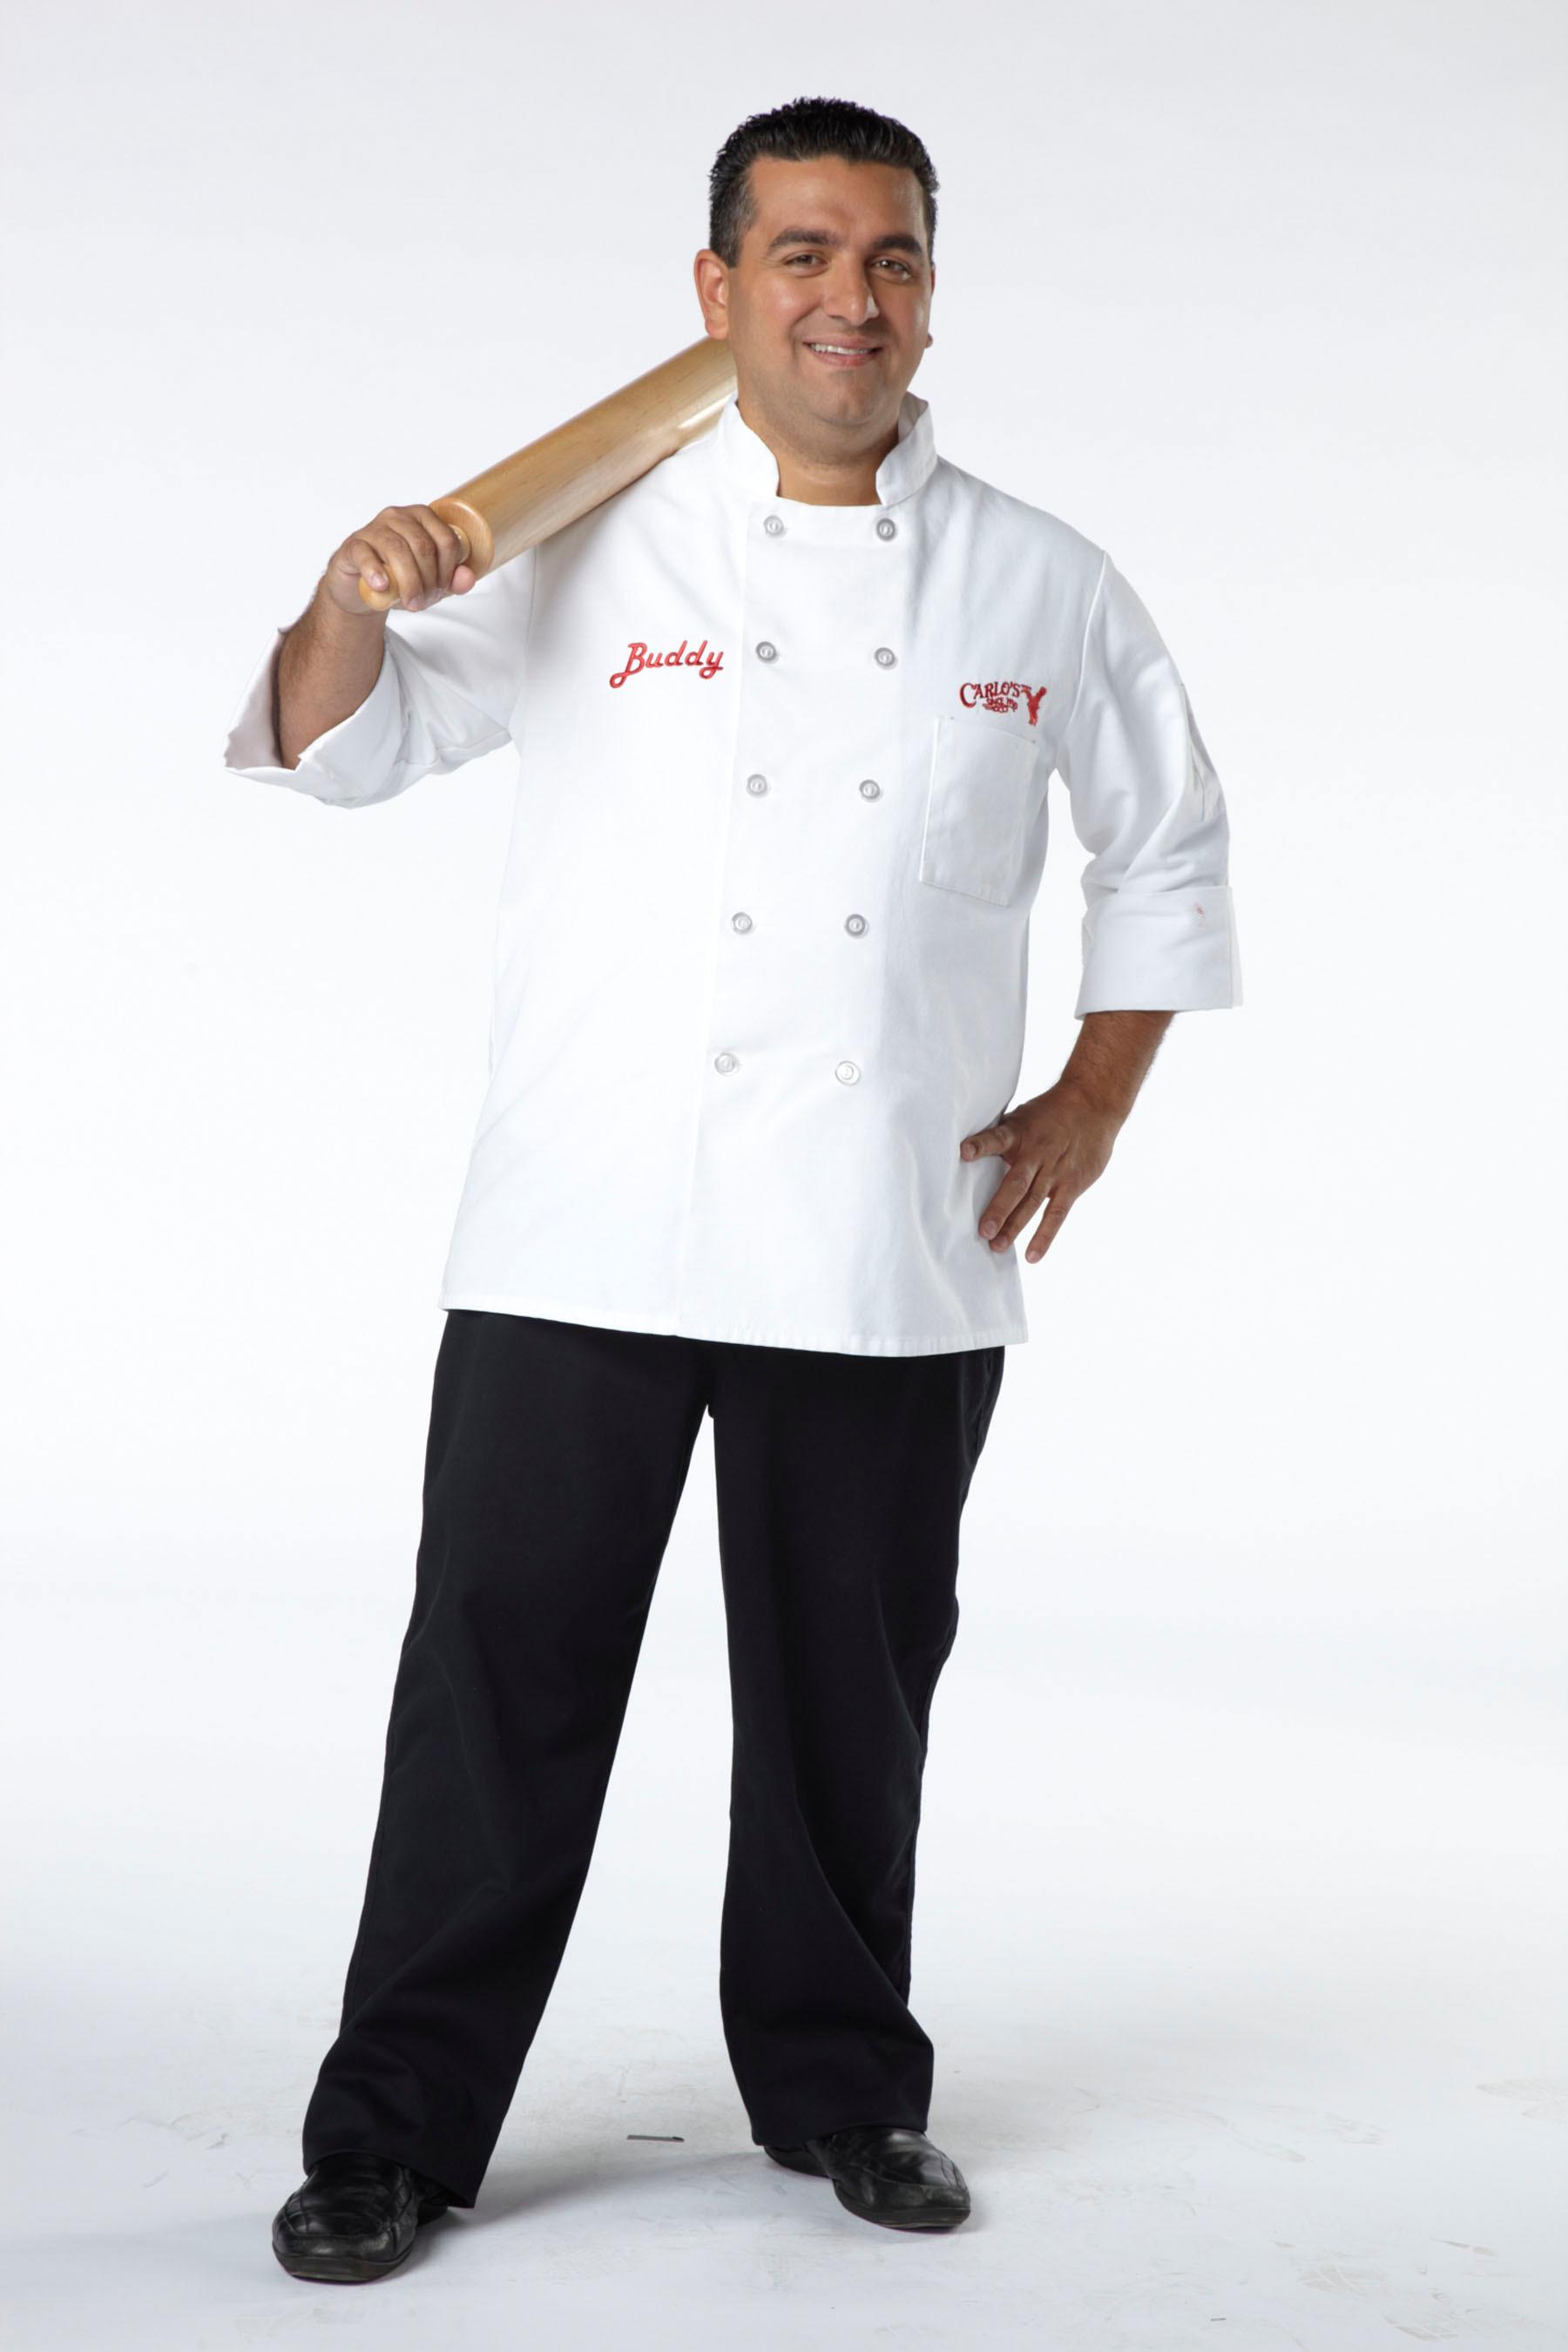 "Bake Like ""The Boss"" with New Cake Boss Baking Products. (PRNewsFoto/Meyer Corporation) (PRNewsFoto/MEYER CORPORATION)"